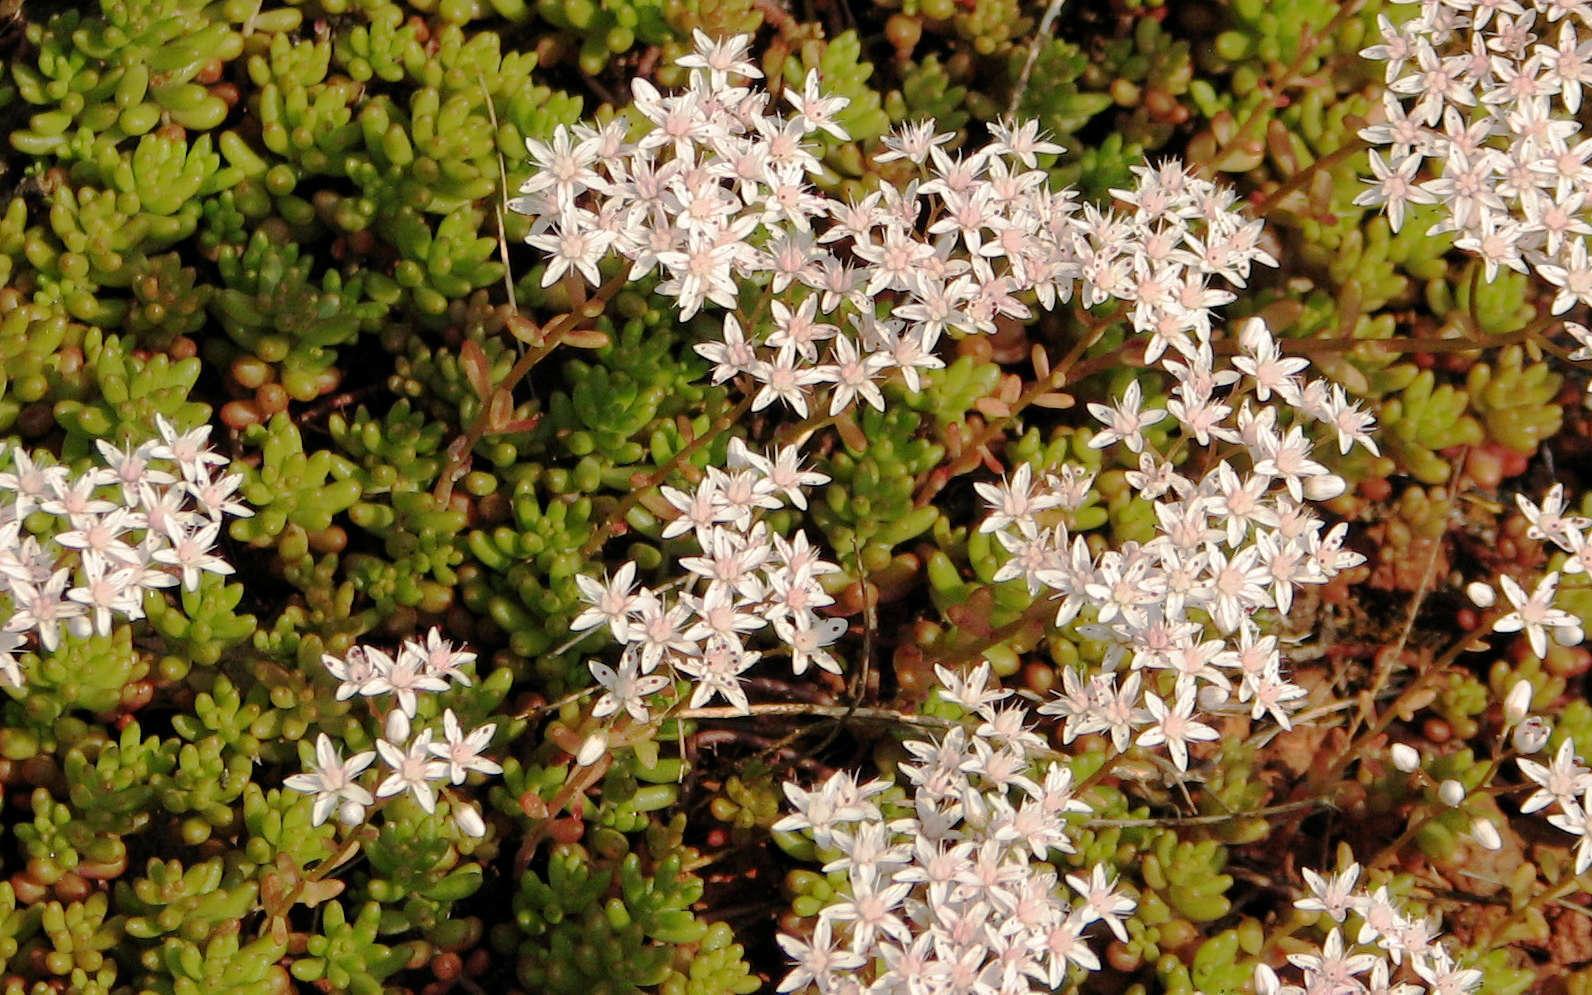 Orpin blanc - fleurs et feuilles (Crédits : Oona Raisanen)